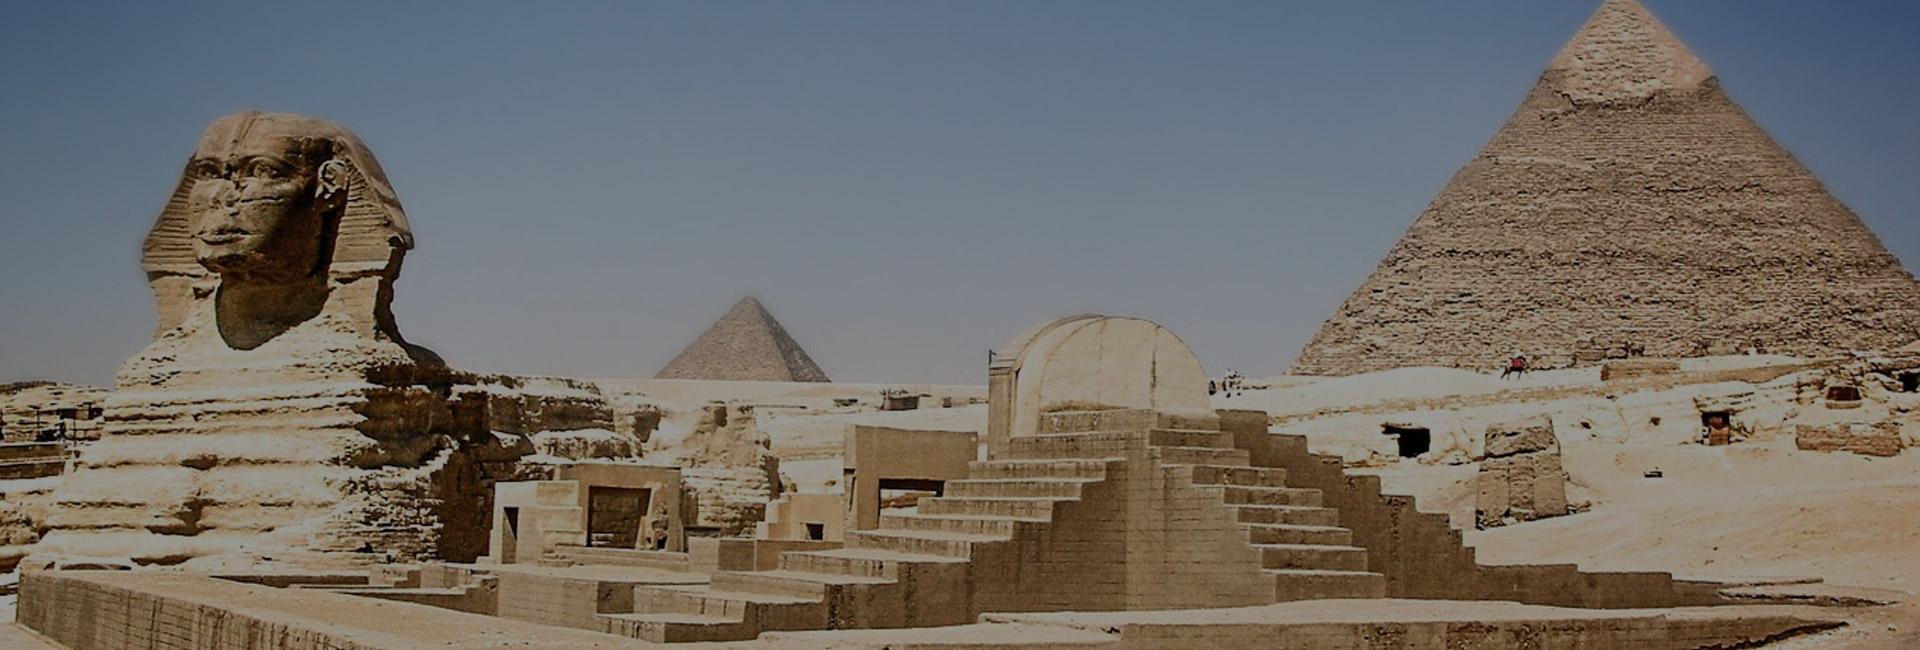 Egypt Tour 9 Days Classic Egypt With Abu Simbel And 3 Night Nile Cruise